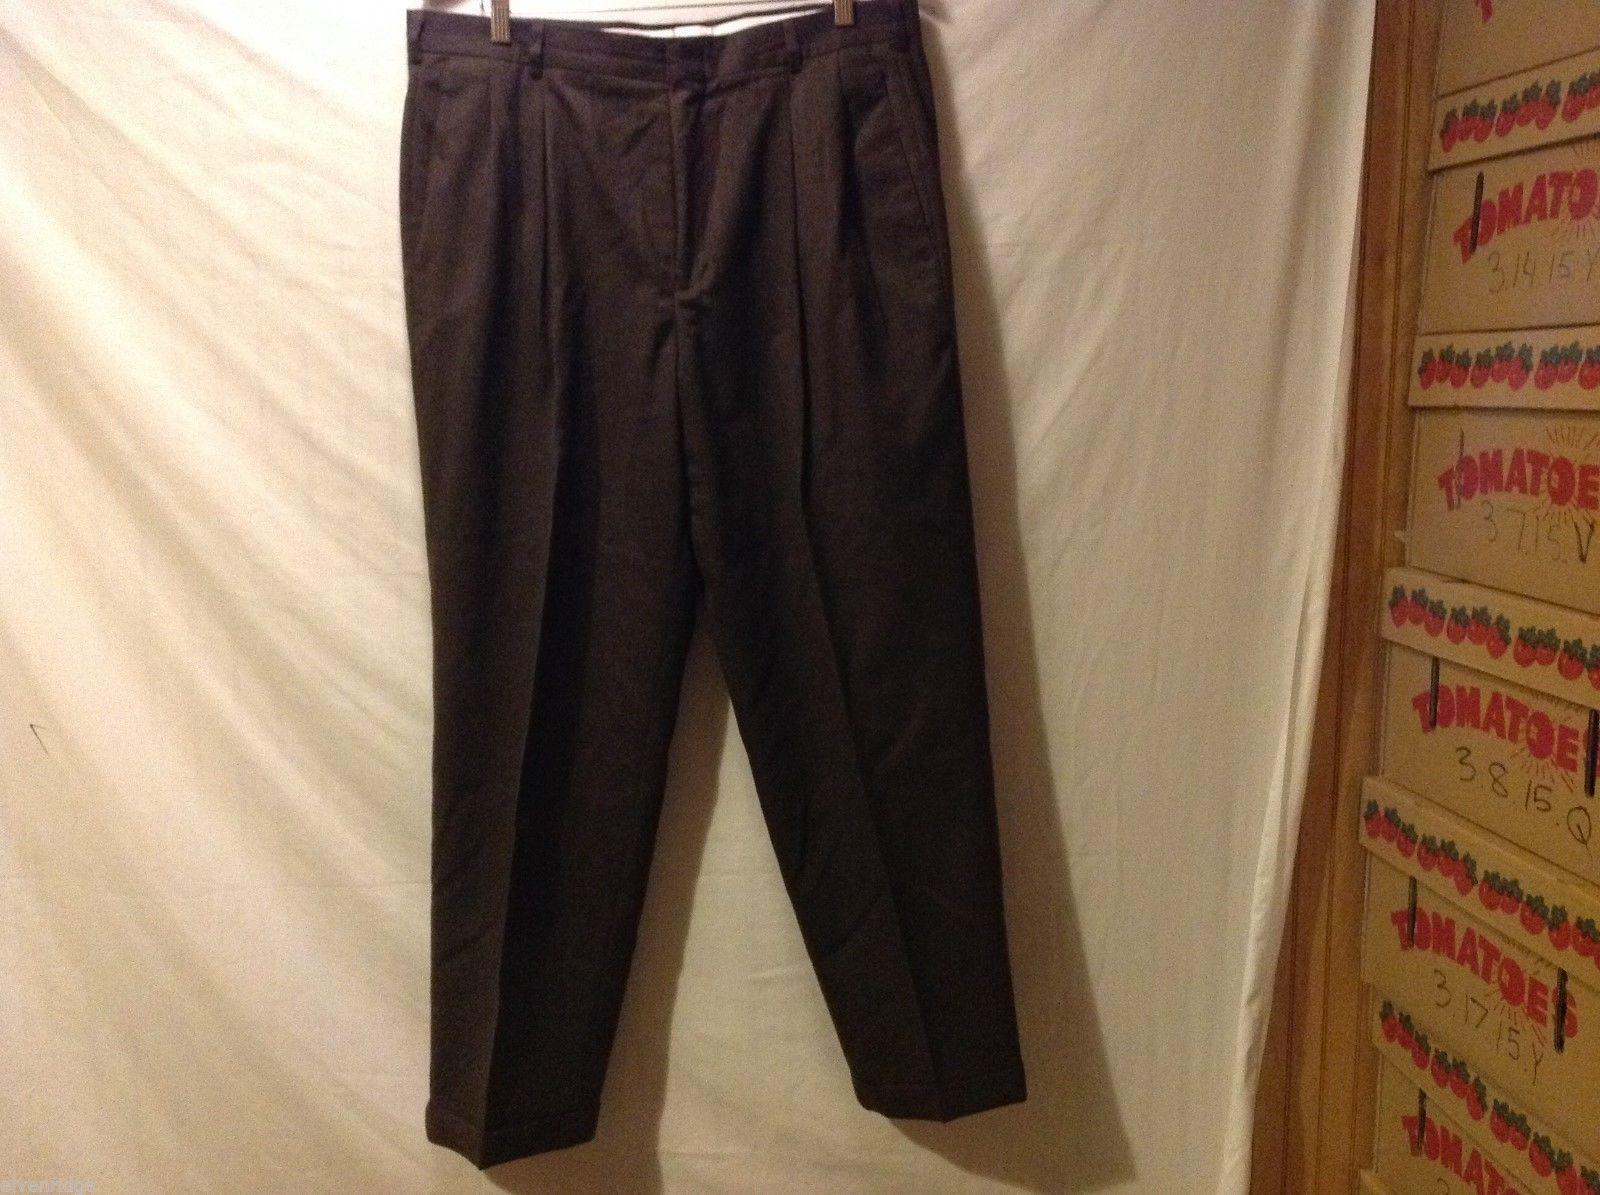 Slates Mens Dark Brown Dress Pants, Size W35 L30